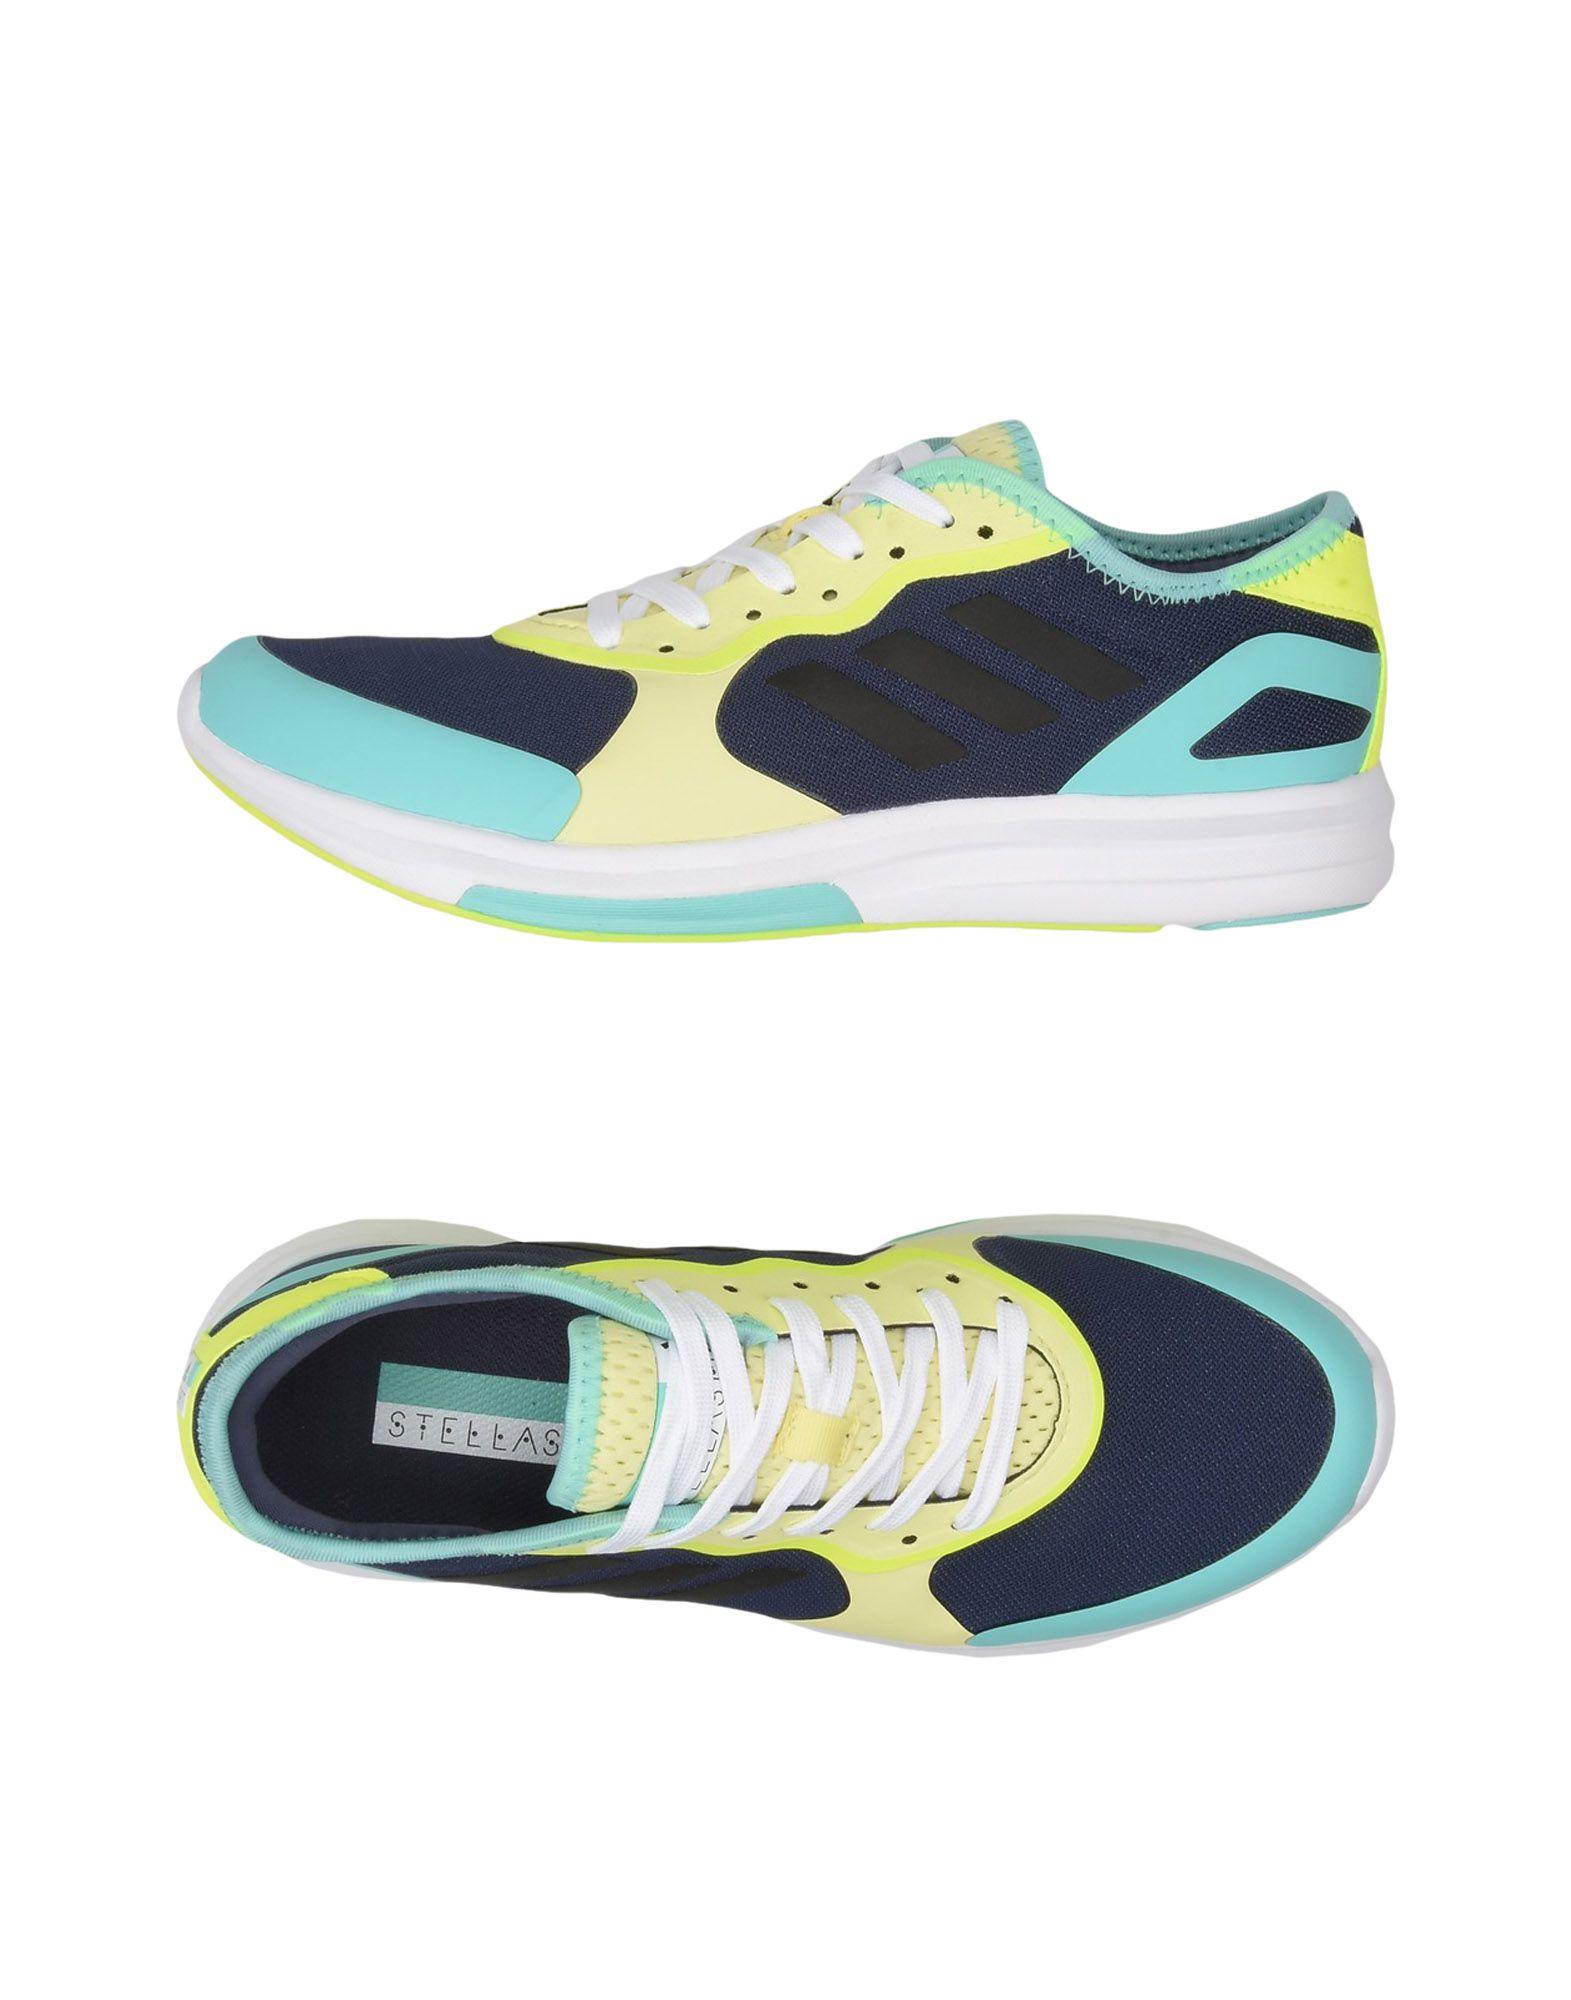 Adidas Stella Sport Yvori Runner Runner Runner - Sneakers - Women Adidas Stella Sport Sneakers online on  Australia - 11215314CG cdb07c